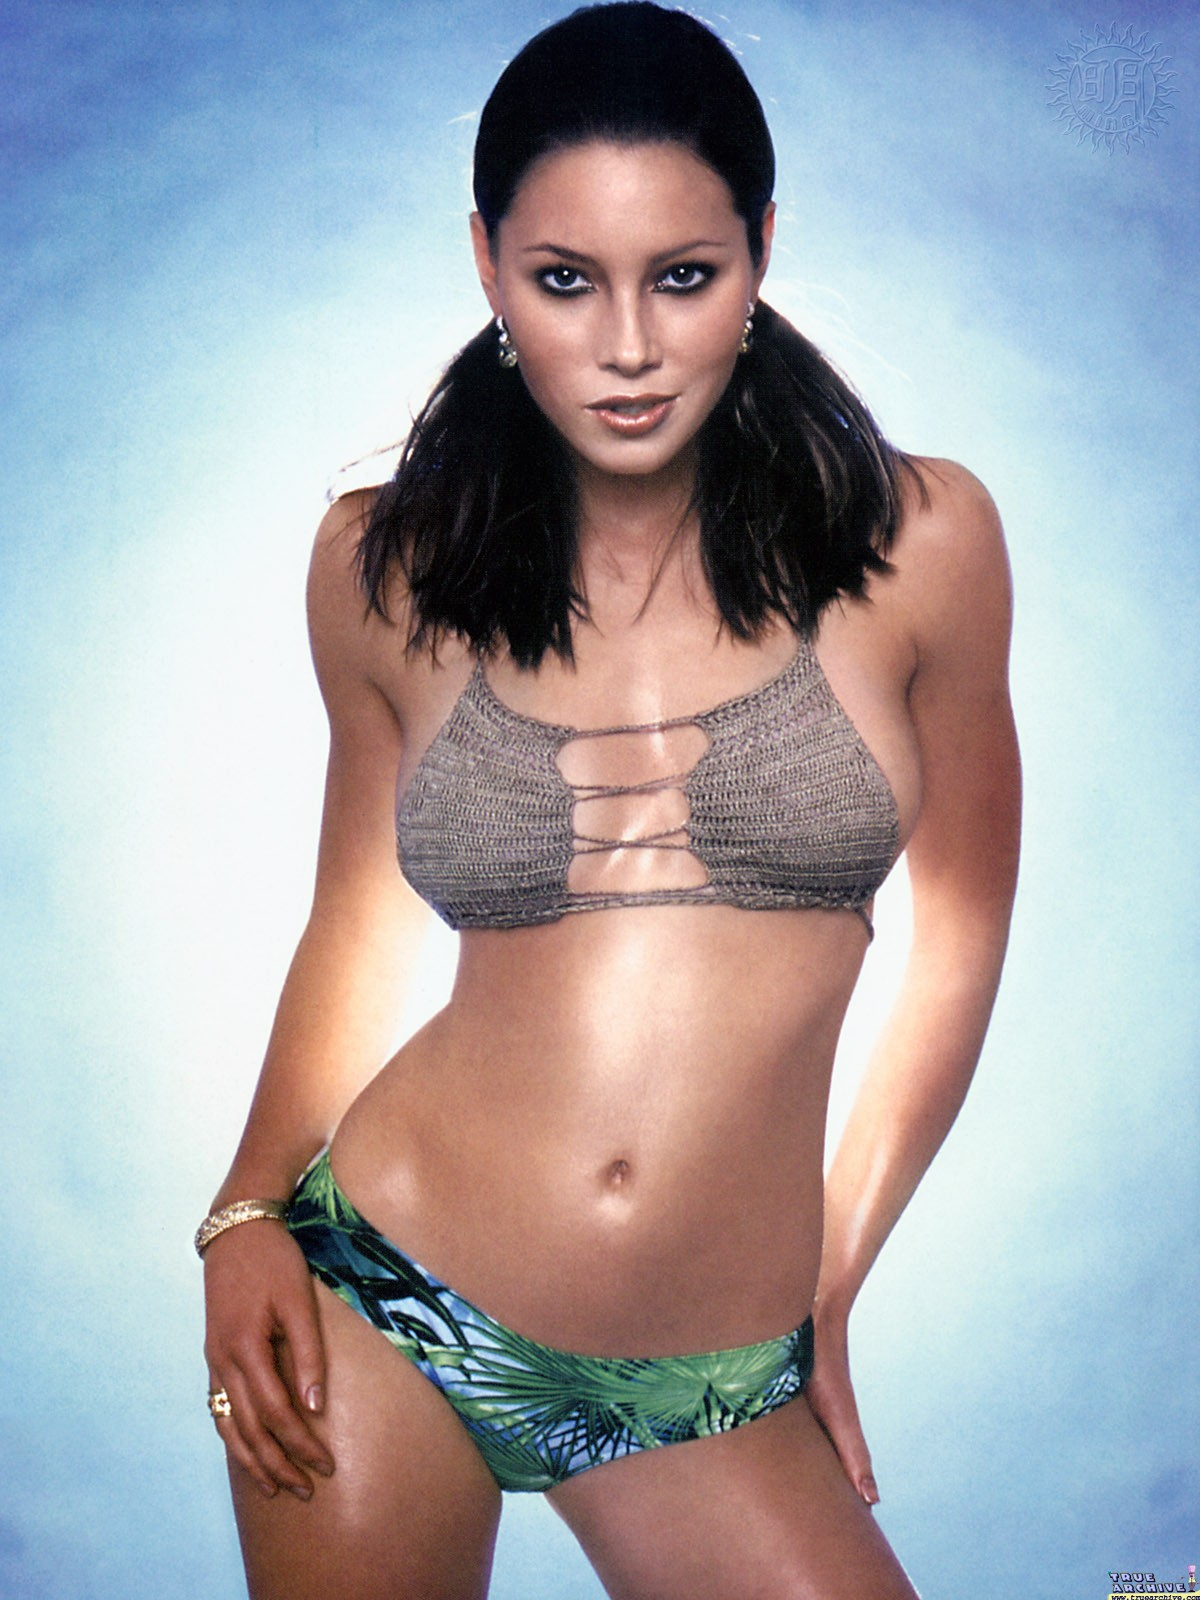 http://1.bp.blogspot.com/-ooEfL9hbFXU/Tq6KzKNgN9I/AAAAAAAACvI/OkY2XY9hC18/s1600/jessica-biel_hot_bikini_100.jpg